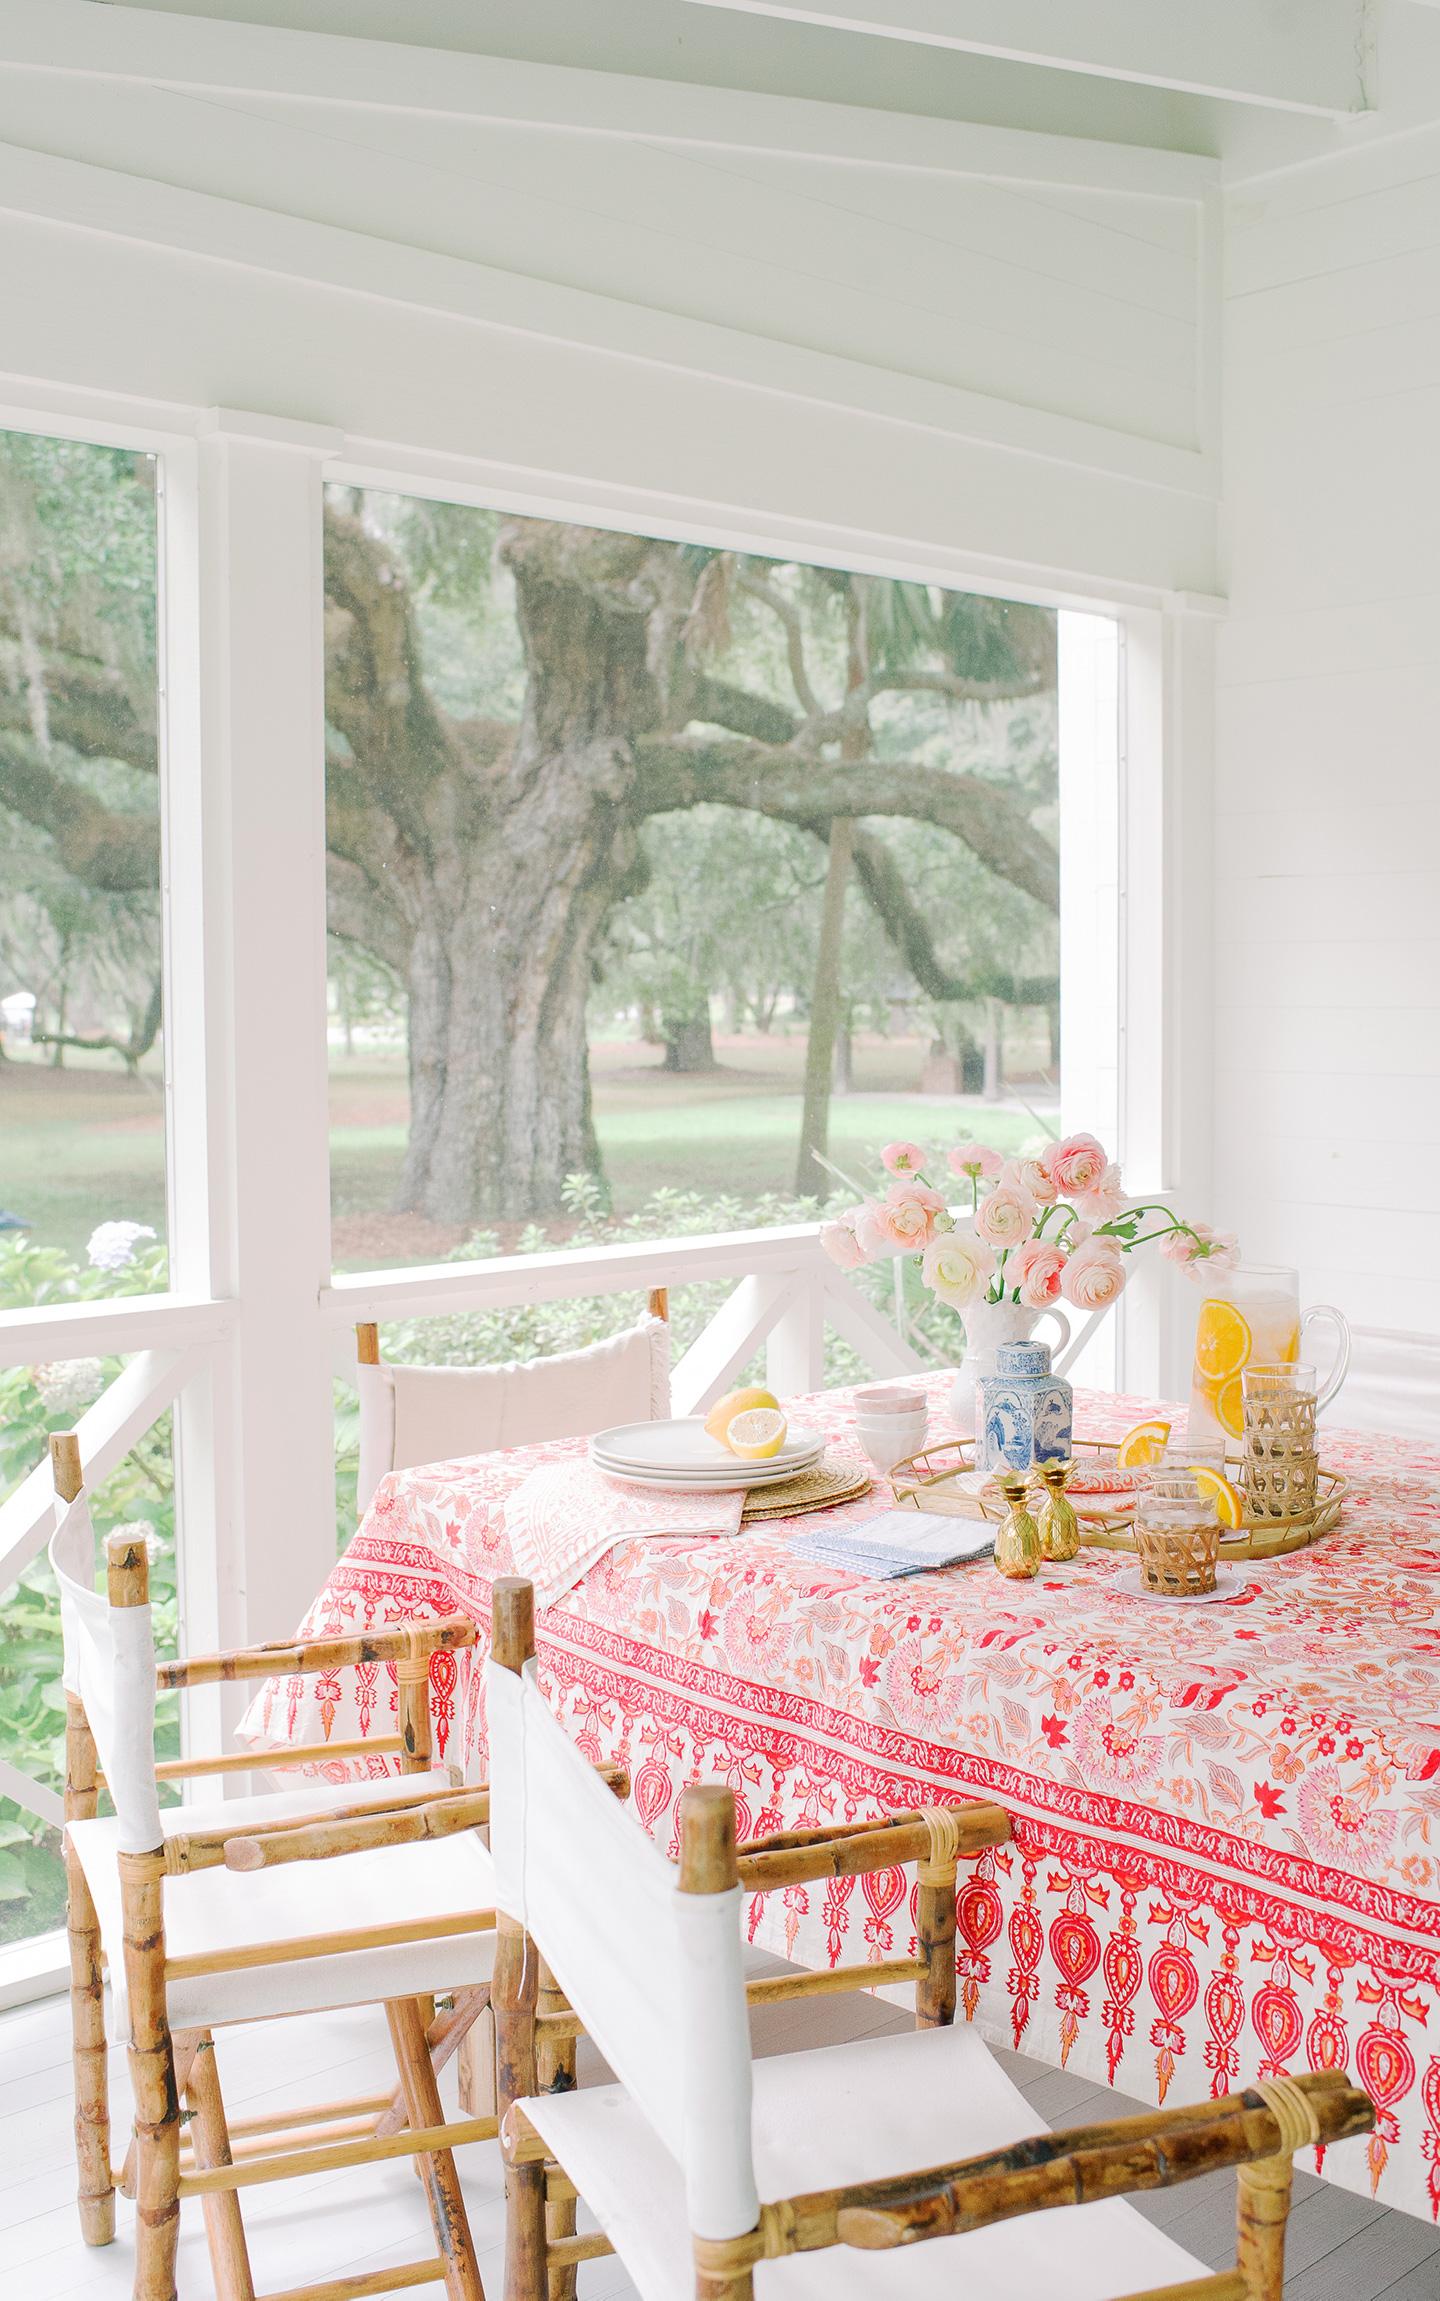 Colorful Spring Tabletop Spread